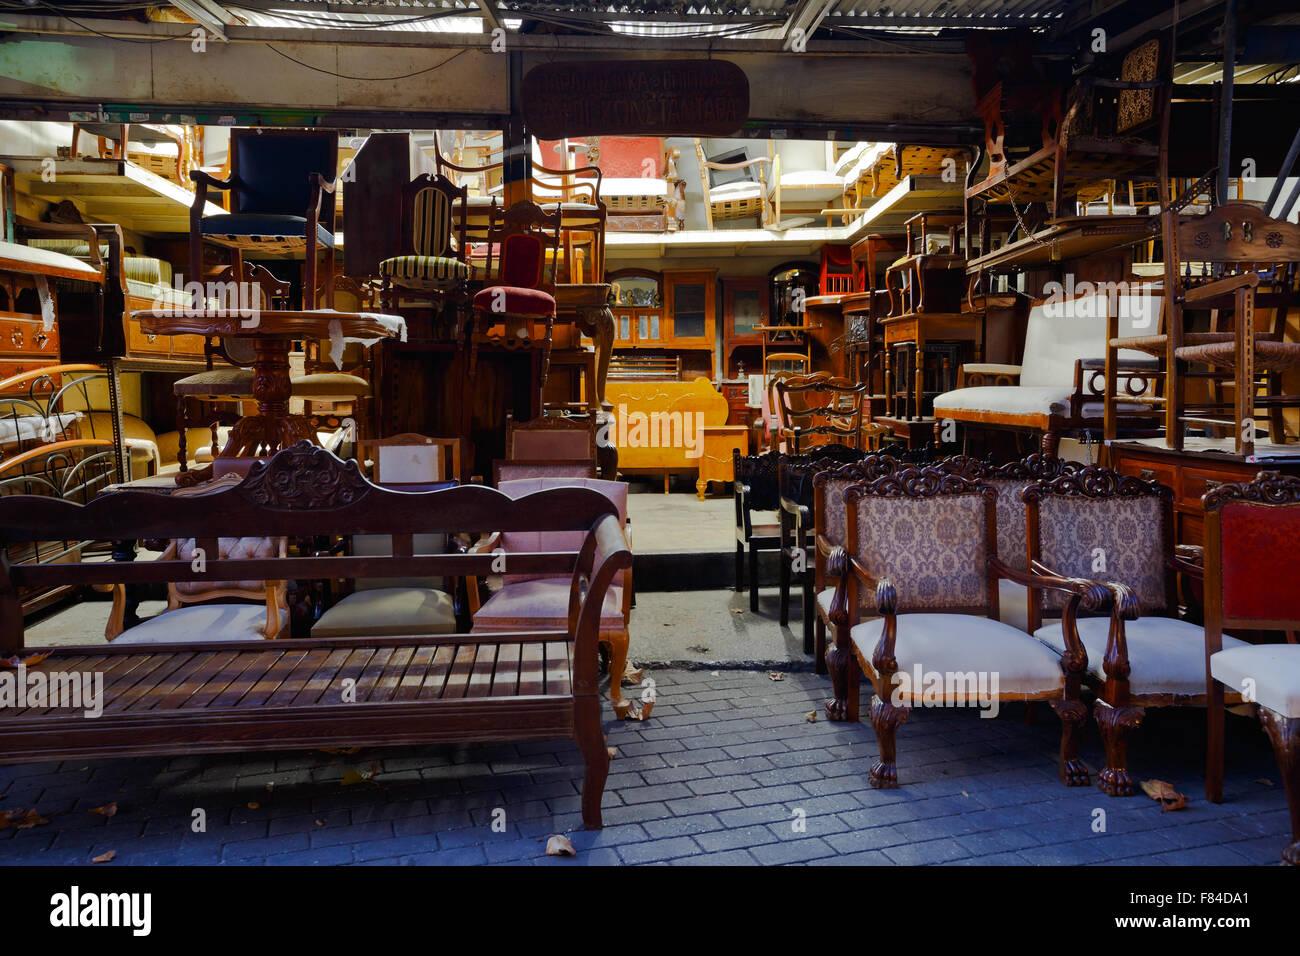 Antique Furniture Shop In The Flea Market In The Monastiraki Area In Plaka,  Athens.